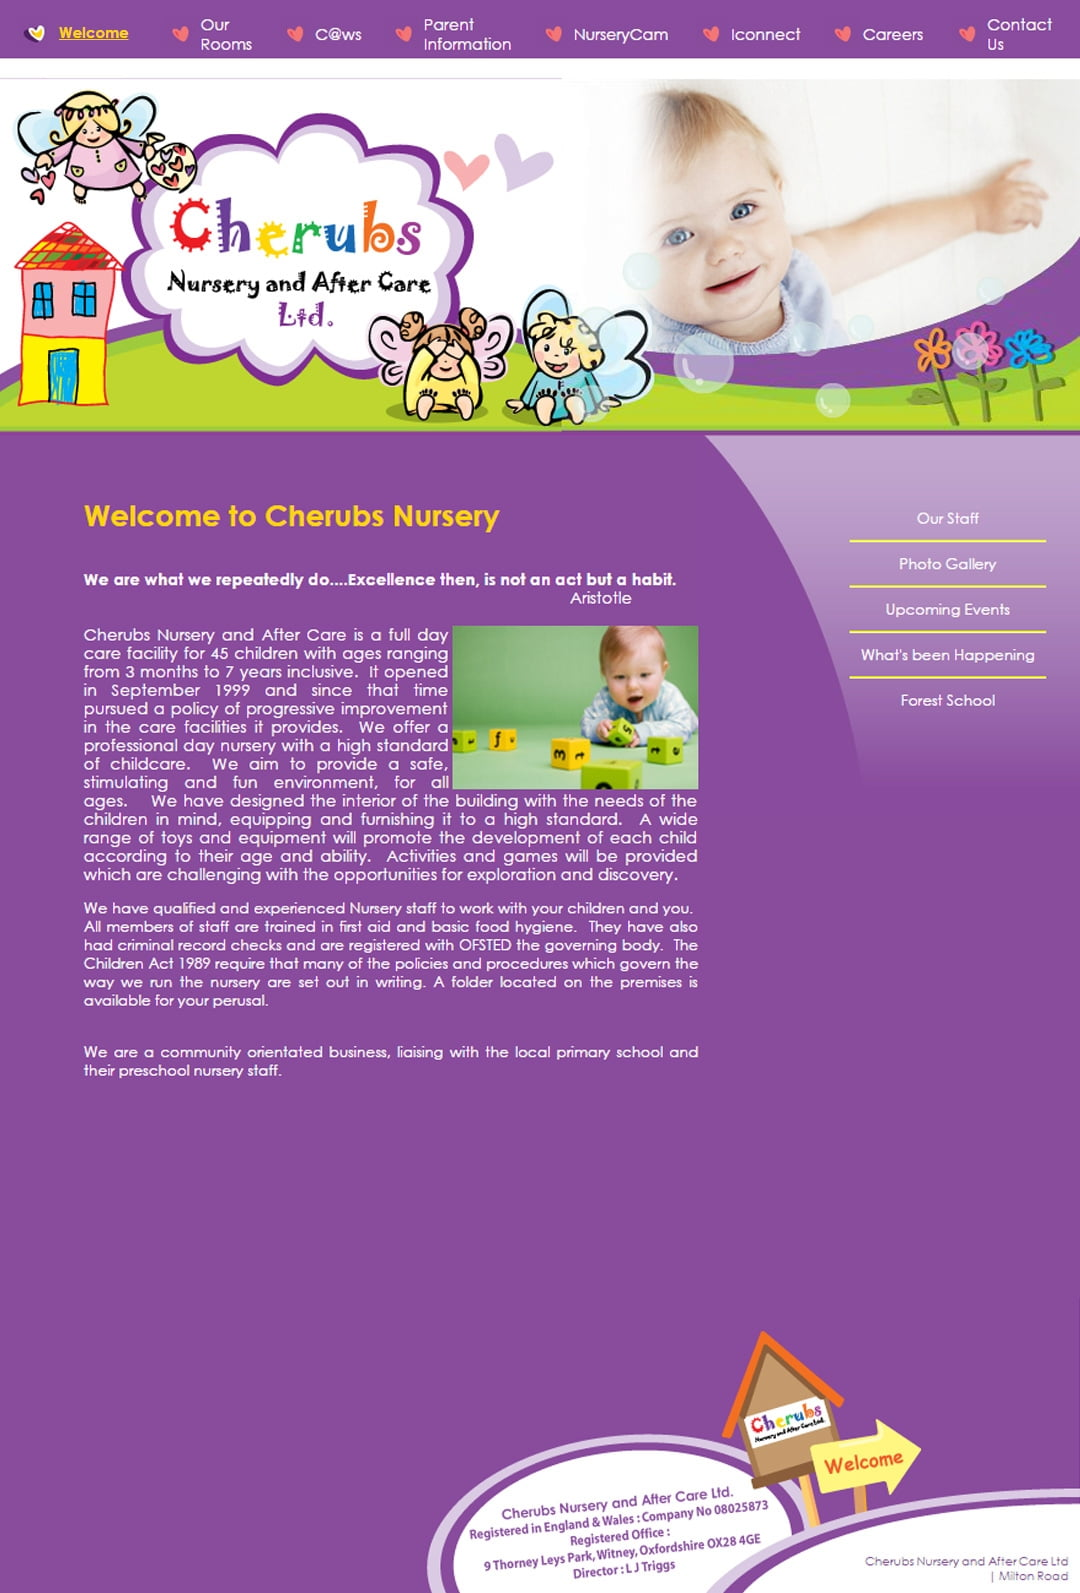 Cherubs Nursery